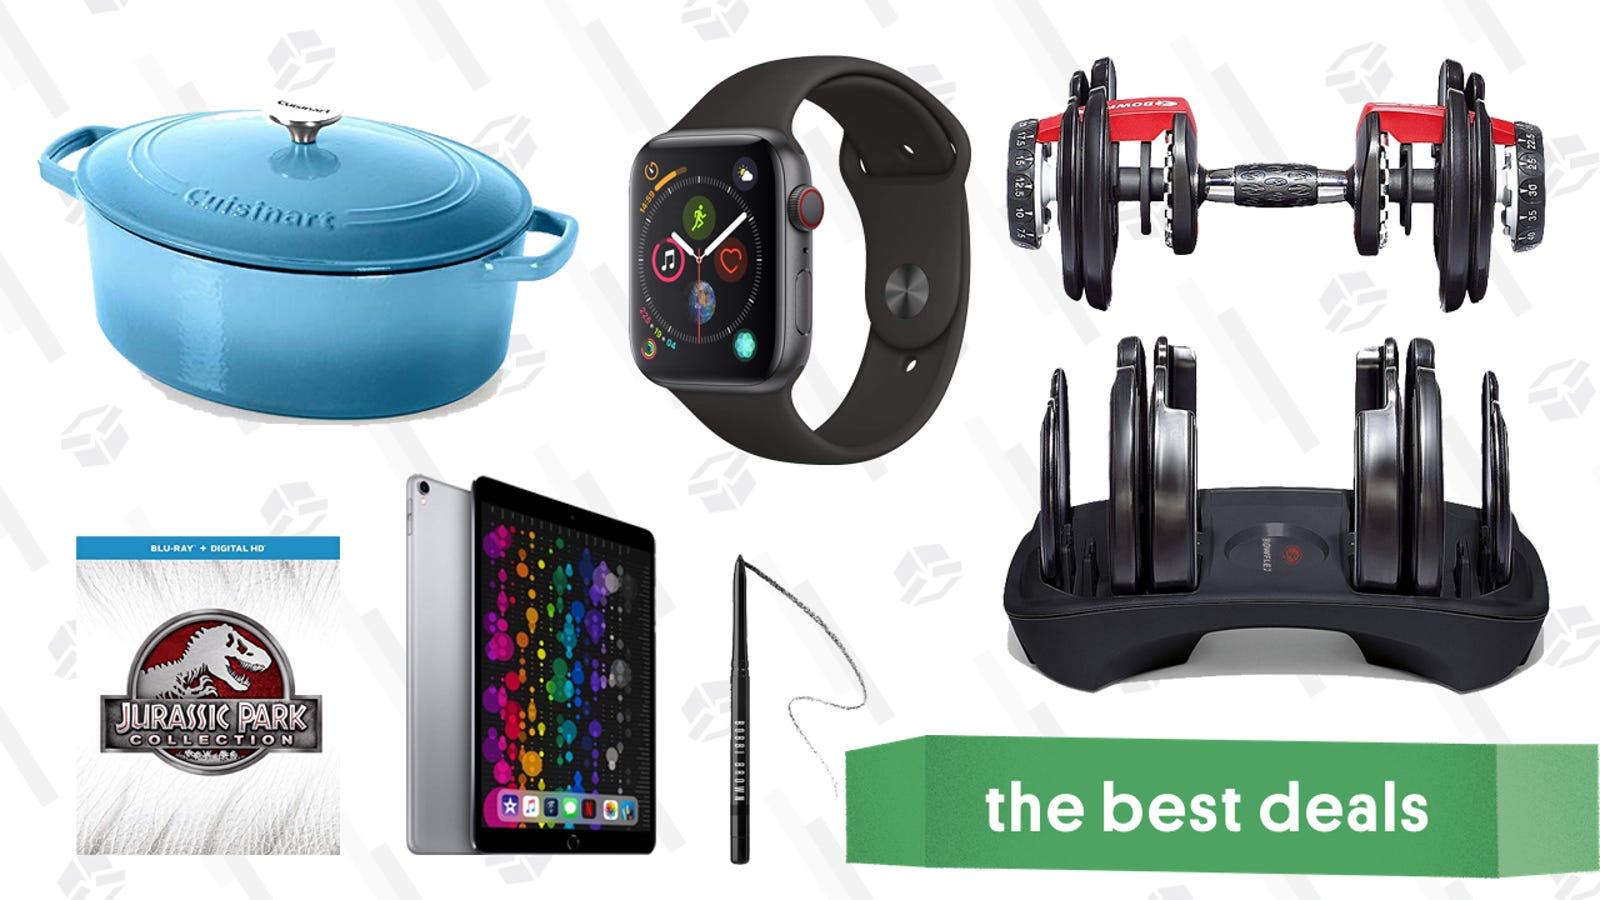 QnA VBage Tuesday's Best Deals: Bowflex Dumbbells, Refurb iPad Pros, Cuisinart Cast Iron, and More